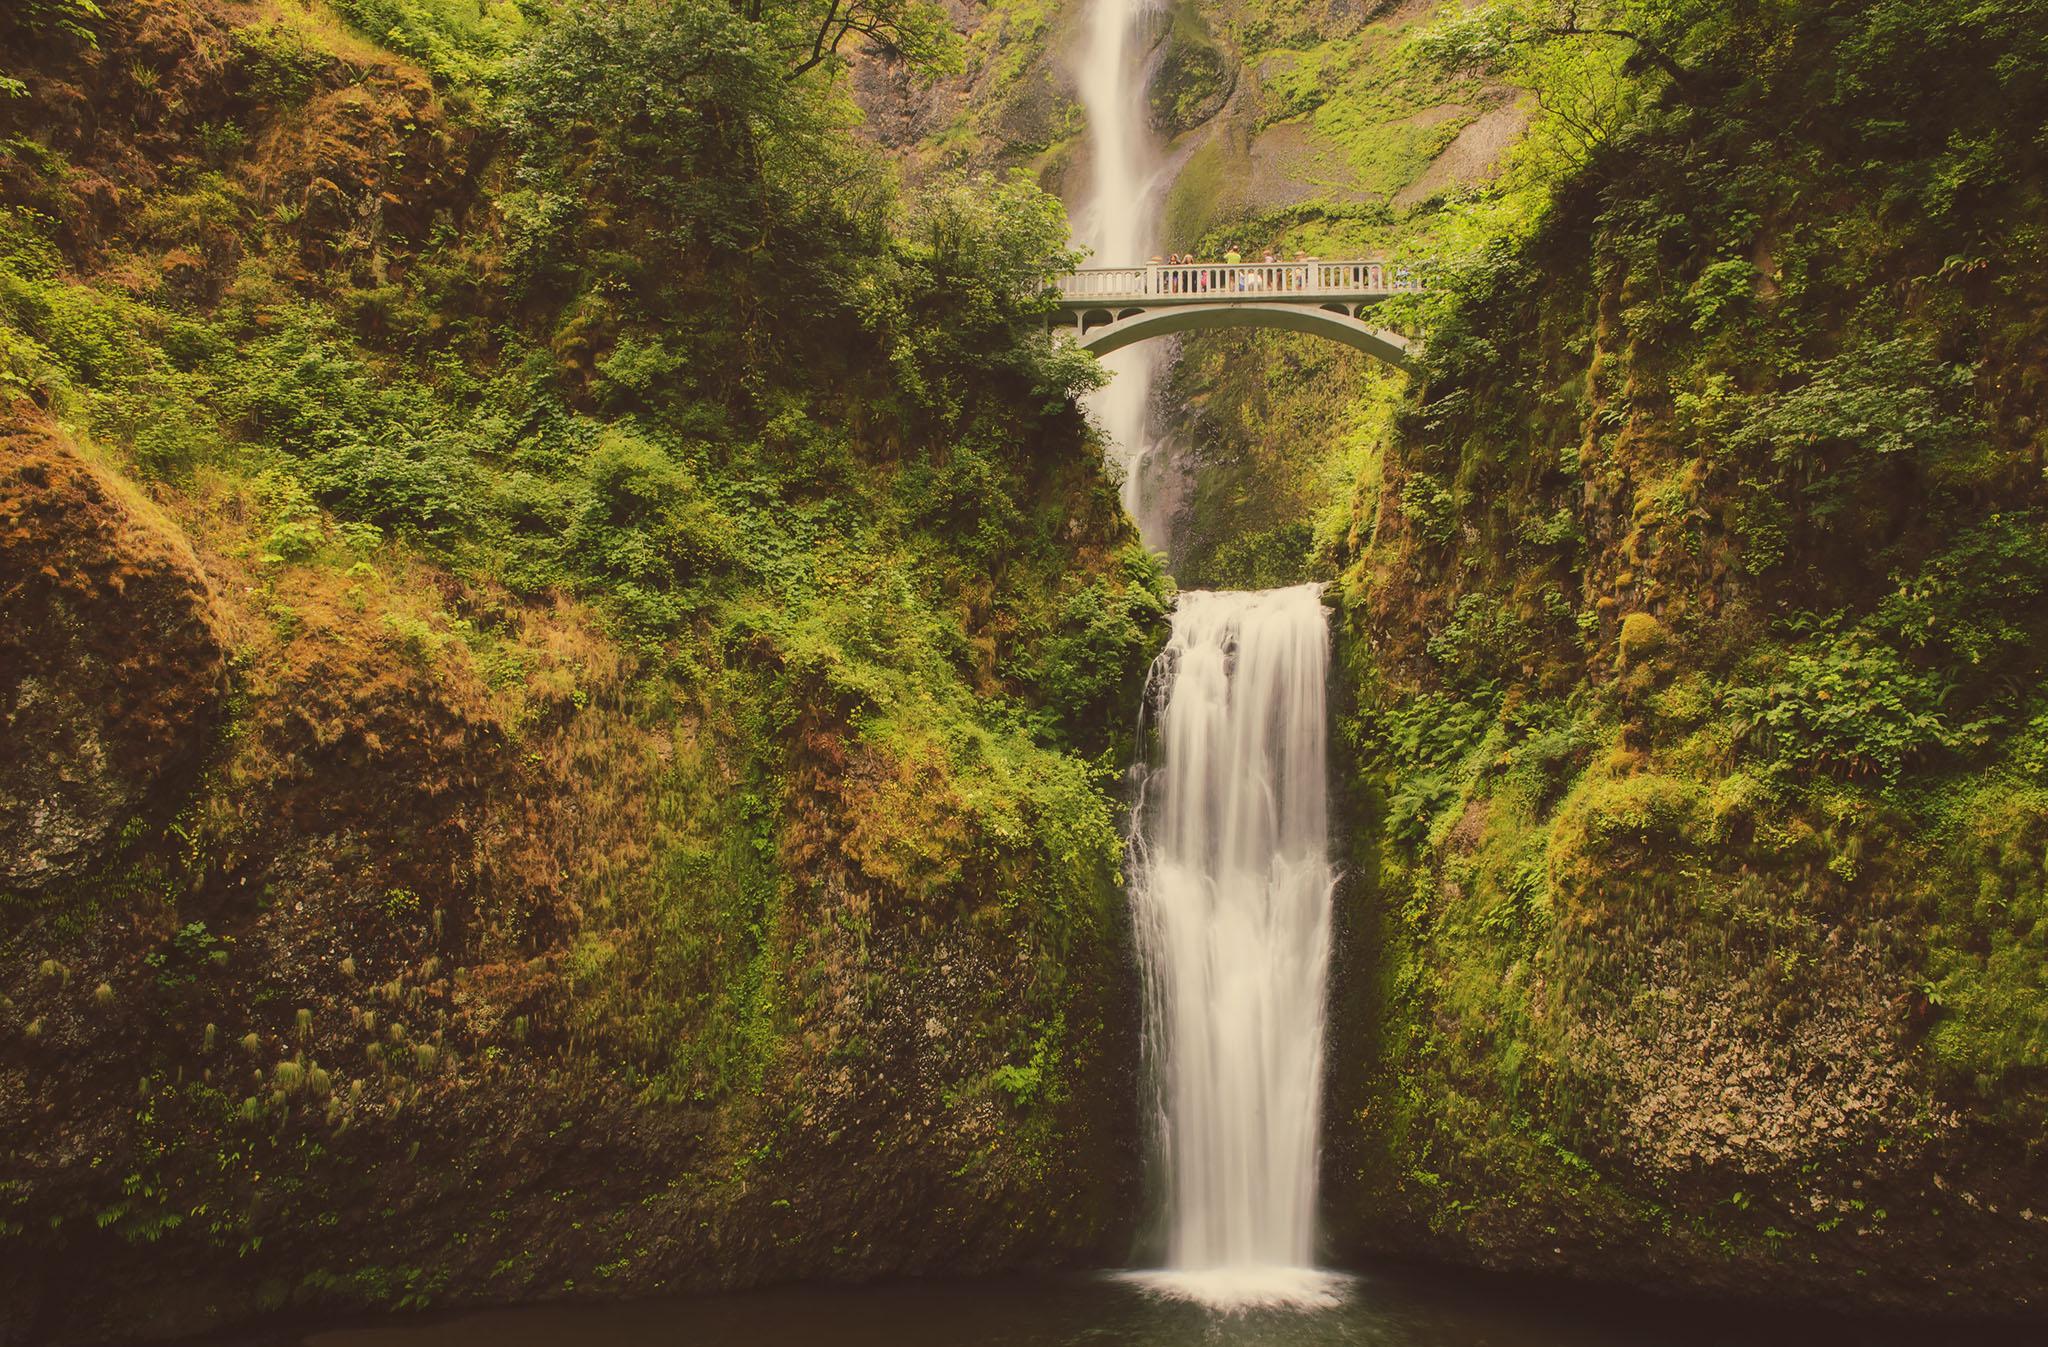 multnomah falls oregon, jennifer picard photography, travel photographer